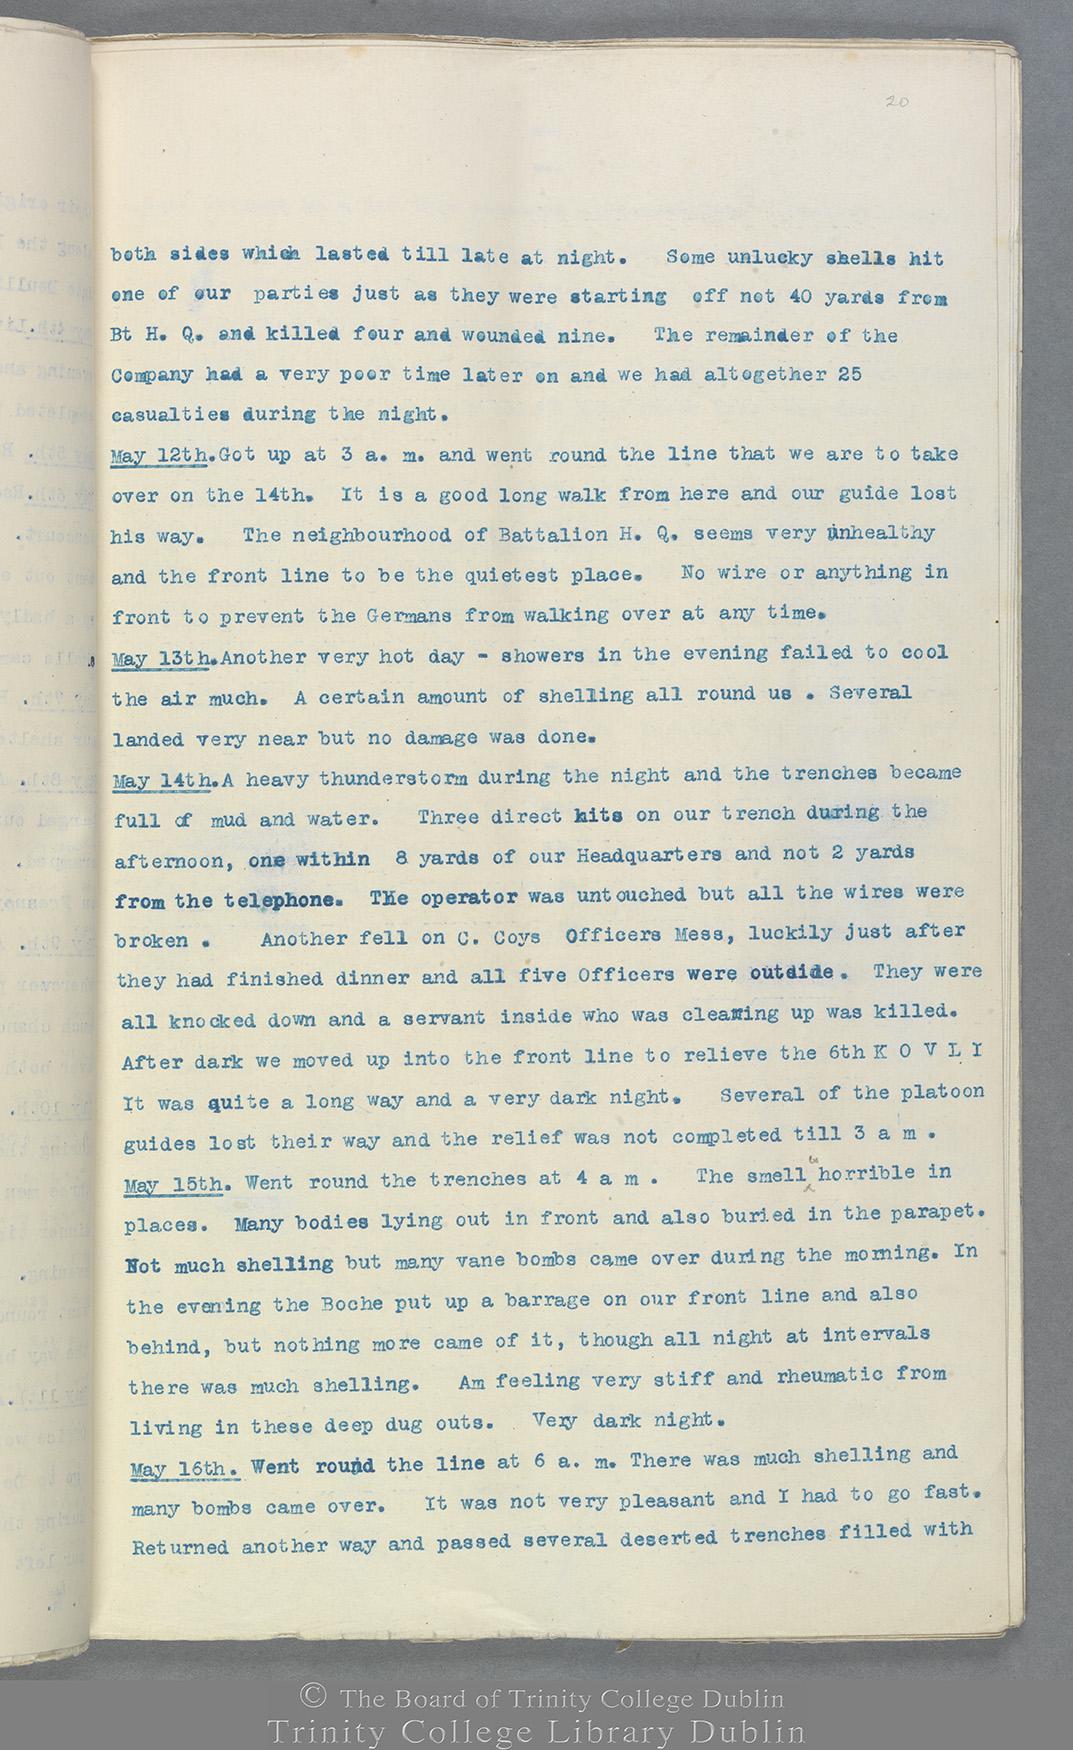 TCD MS 10822 folio 20 recto